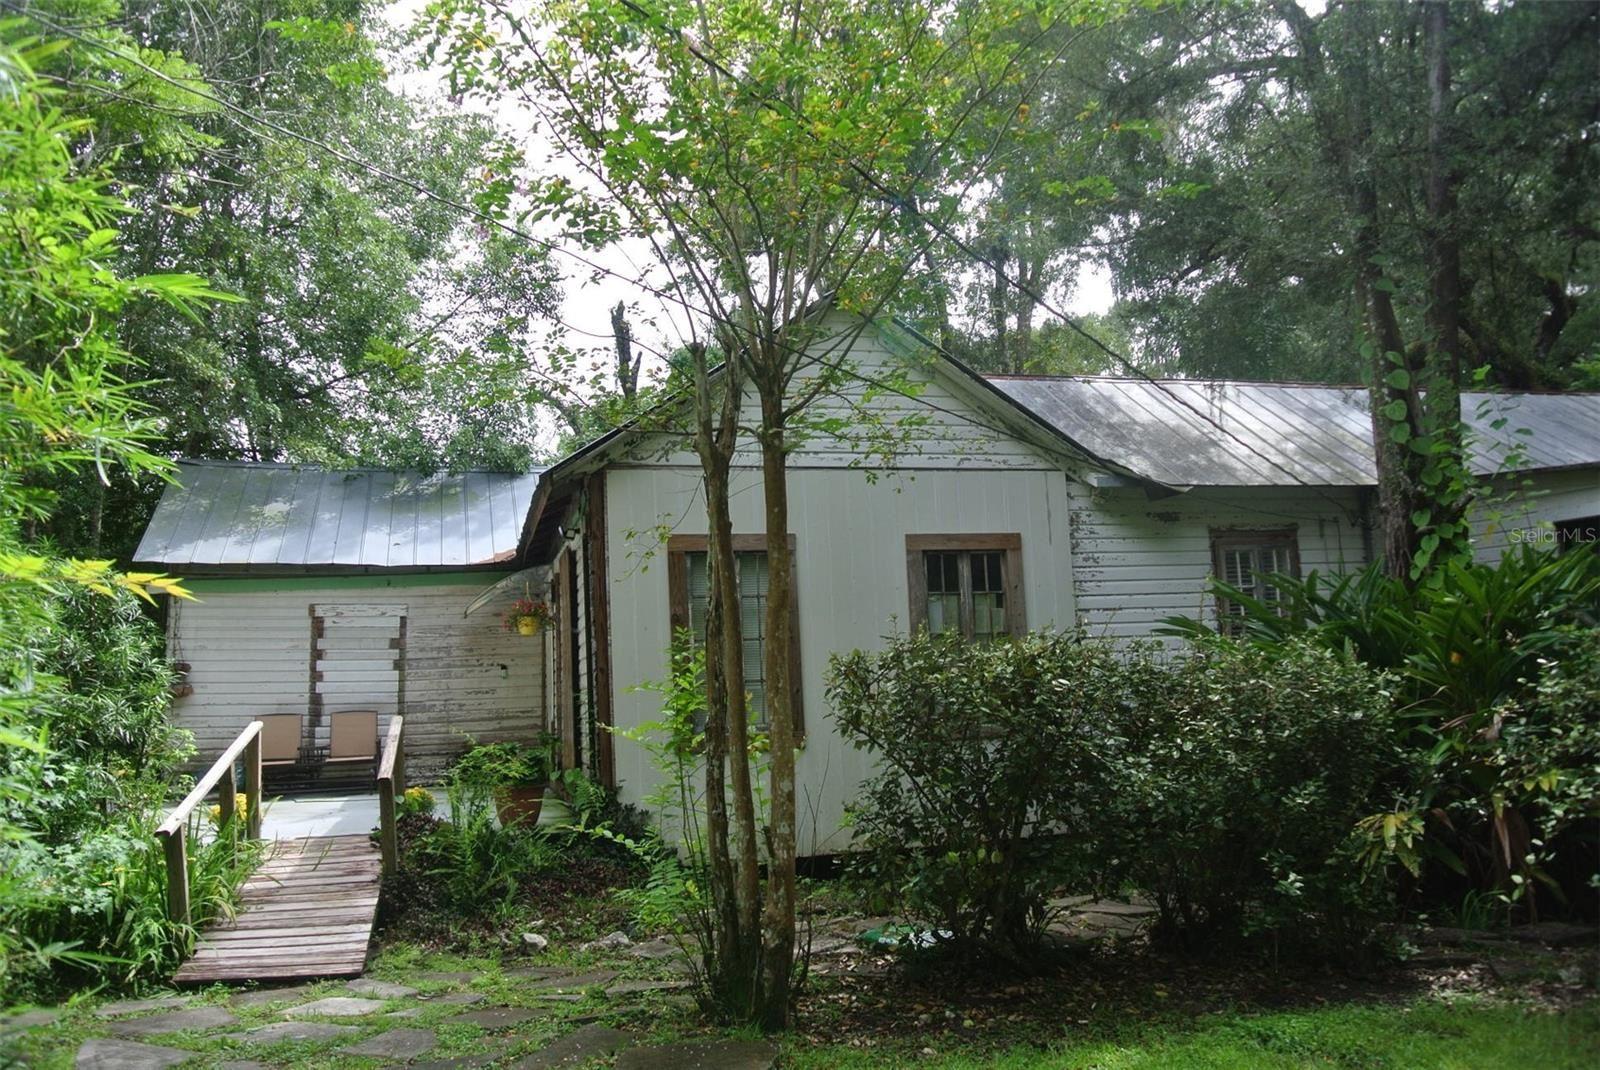 433 STAFFORD AVENUE, Brooksville, FL 34601 - #: U8134918